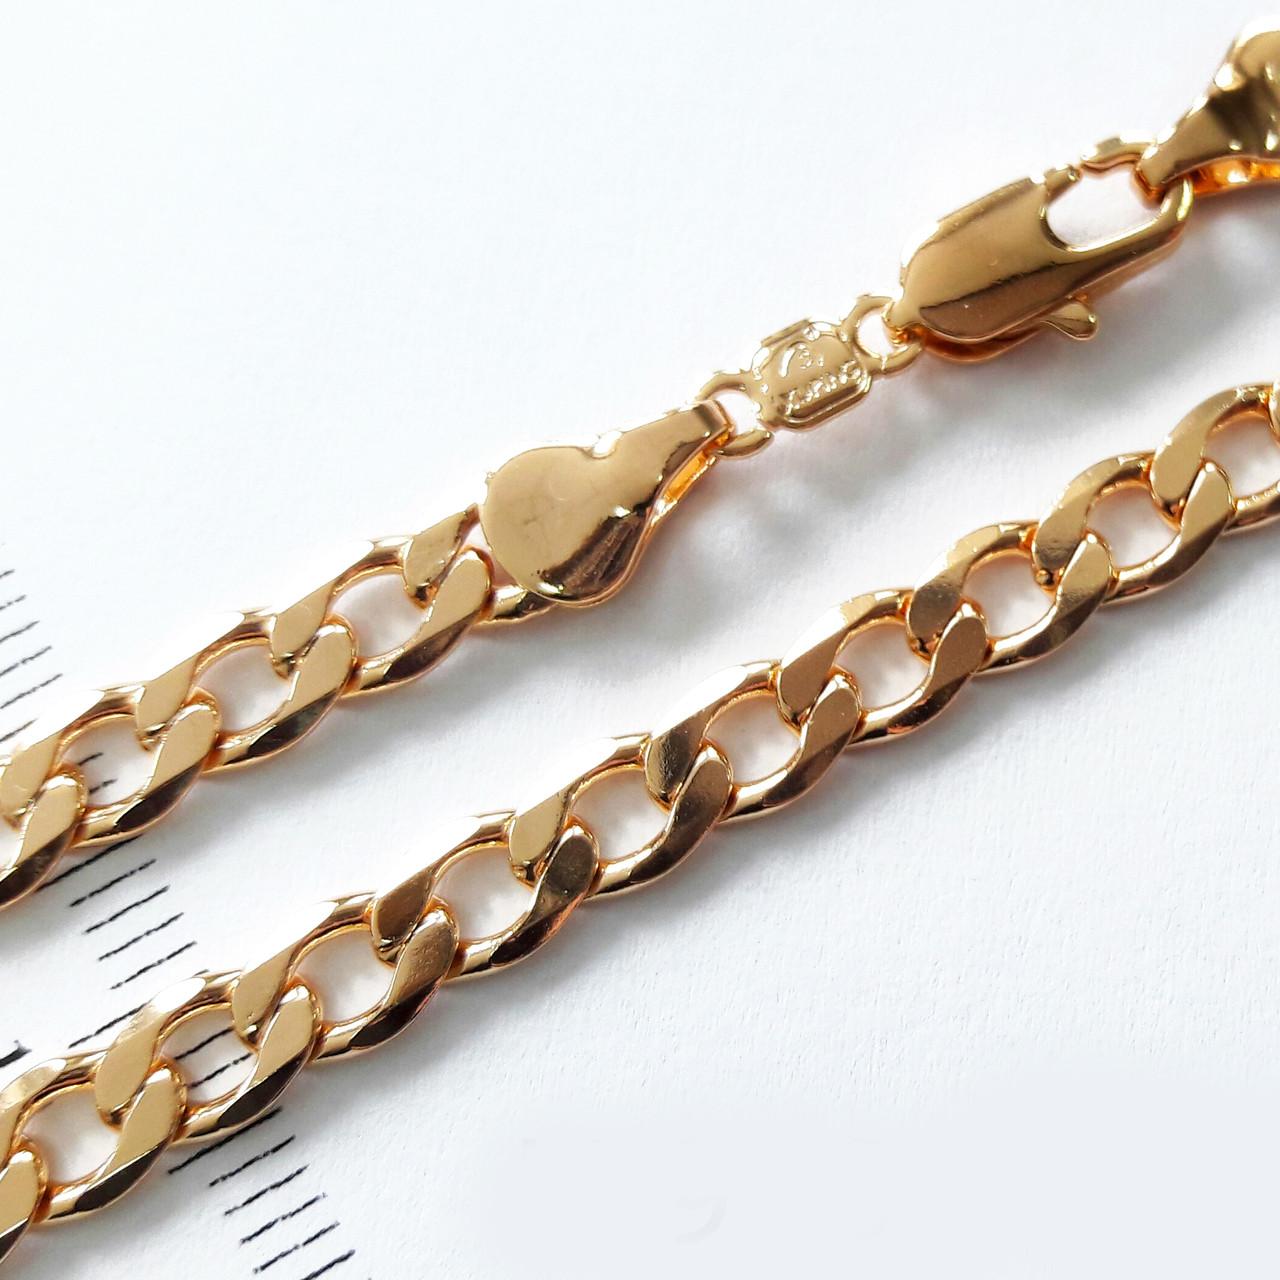 Цепочка xuping 5мм 60см панцирное плетение ц351